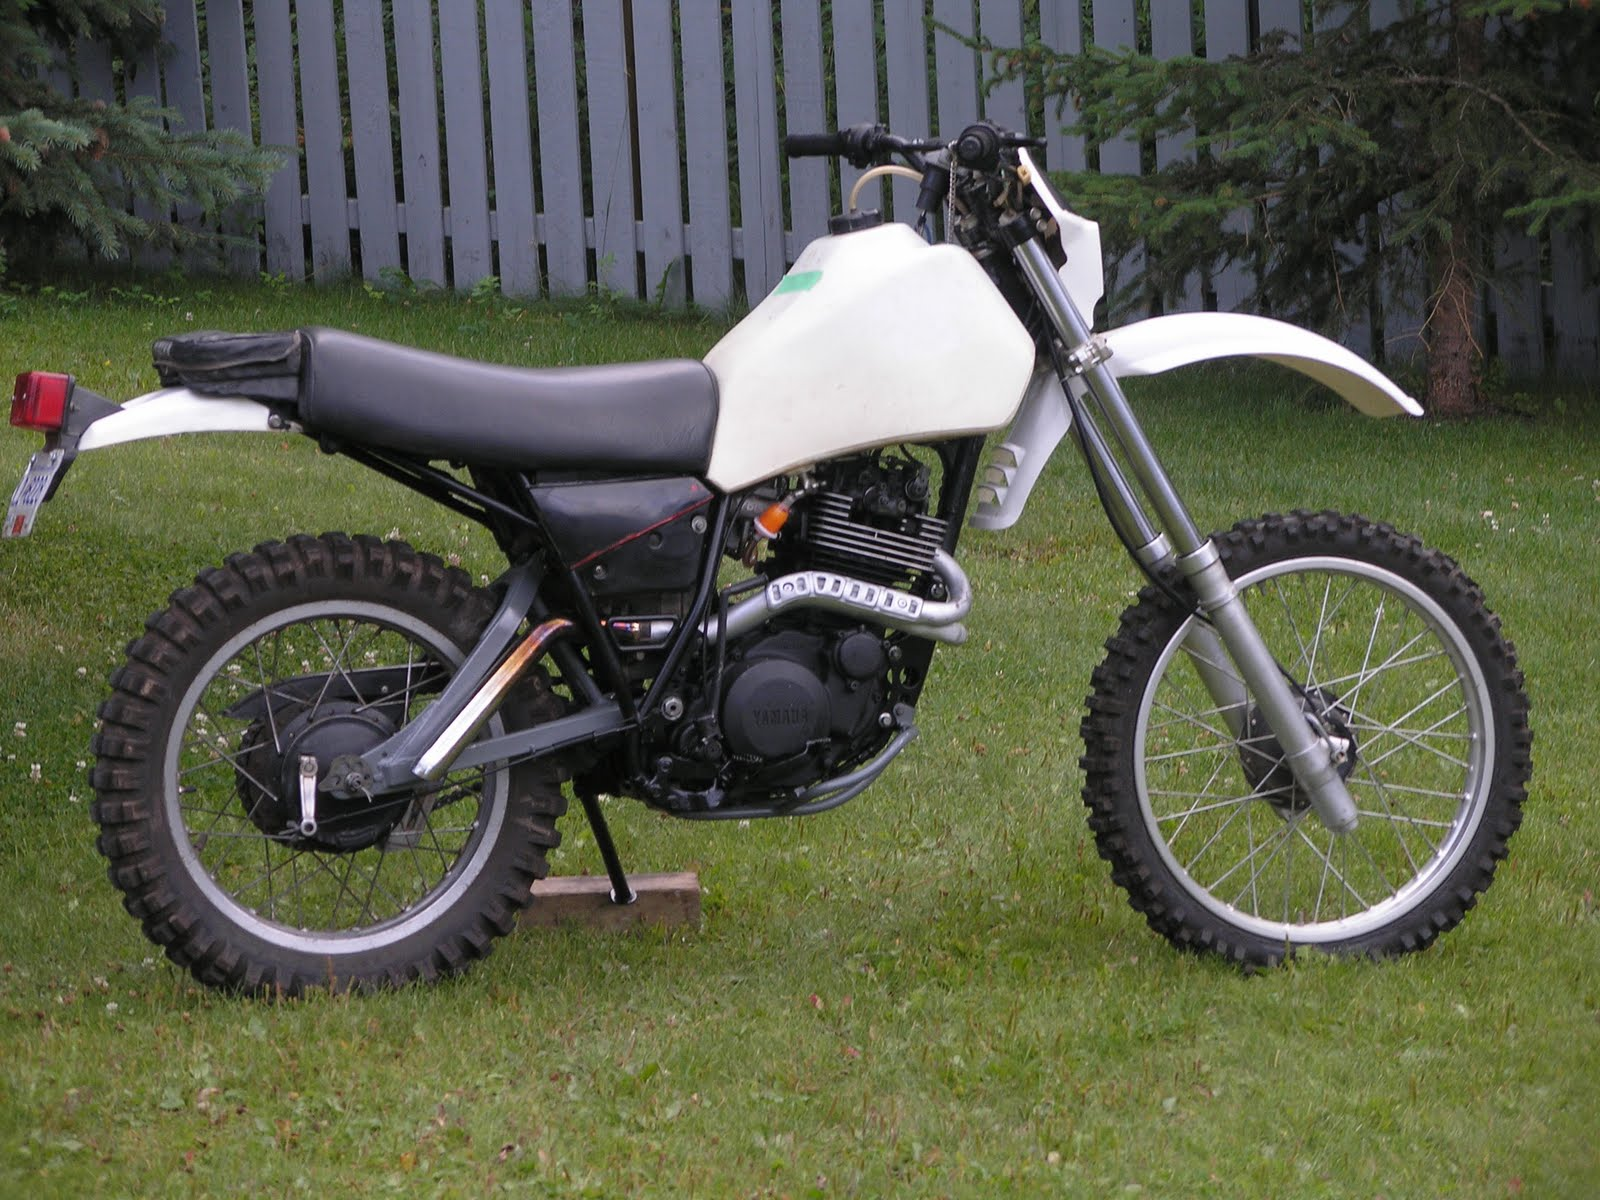 Yamaha P Cover